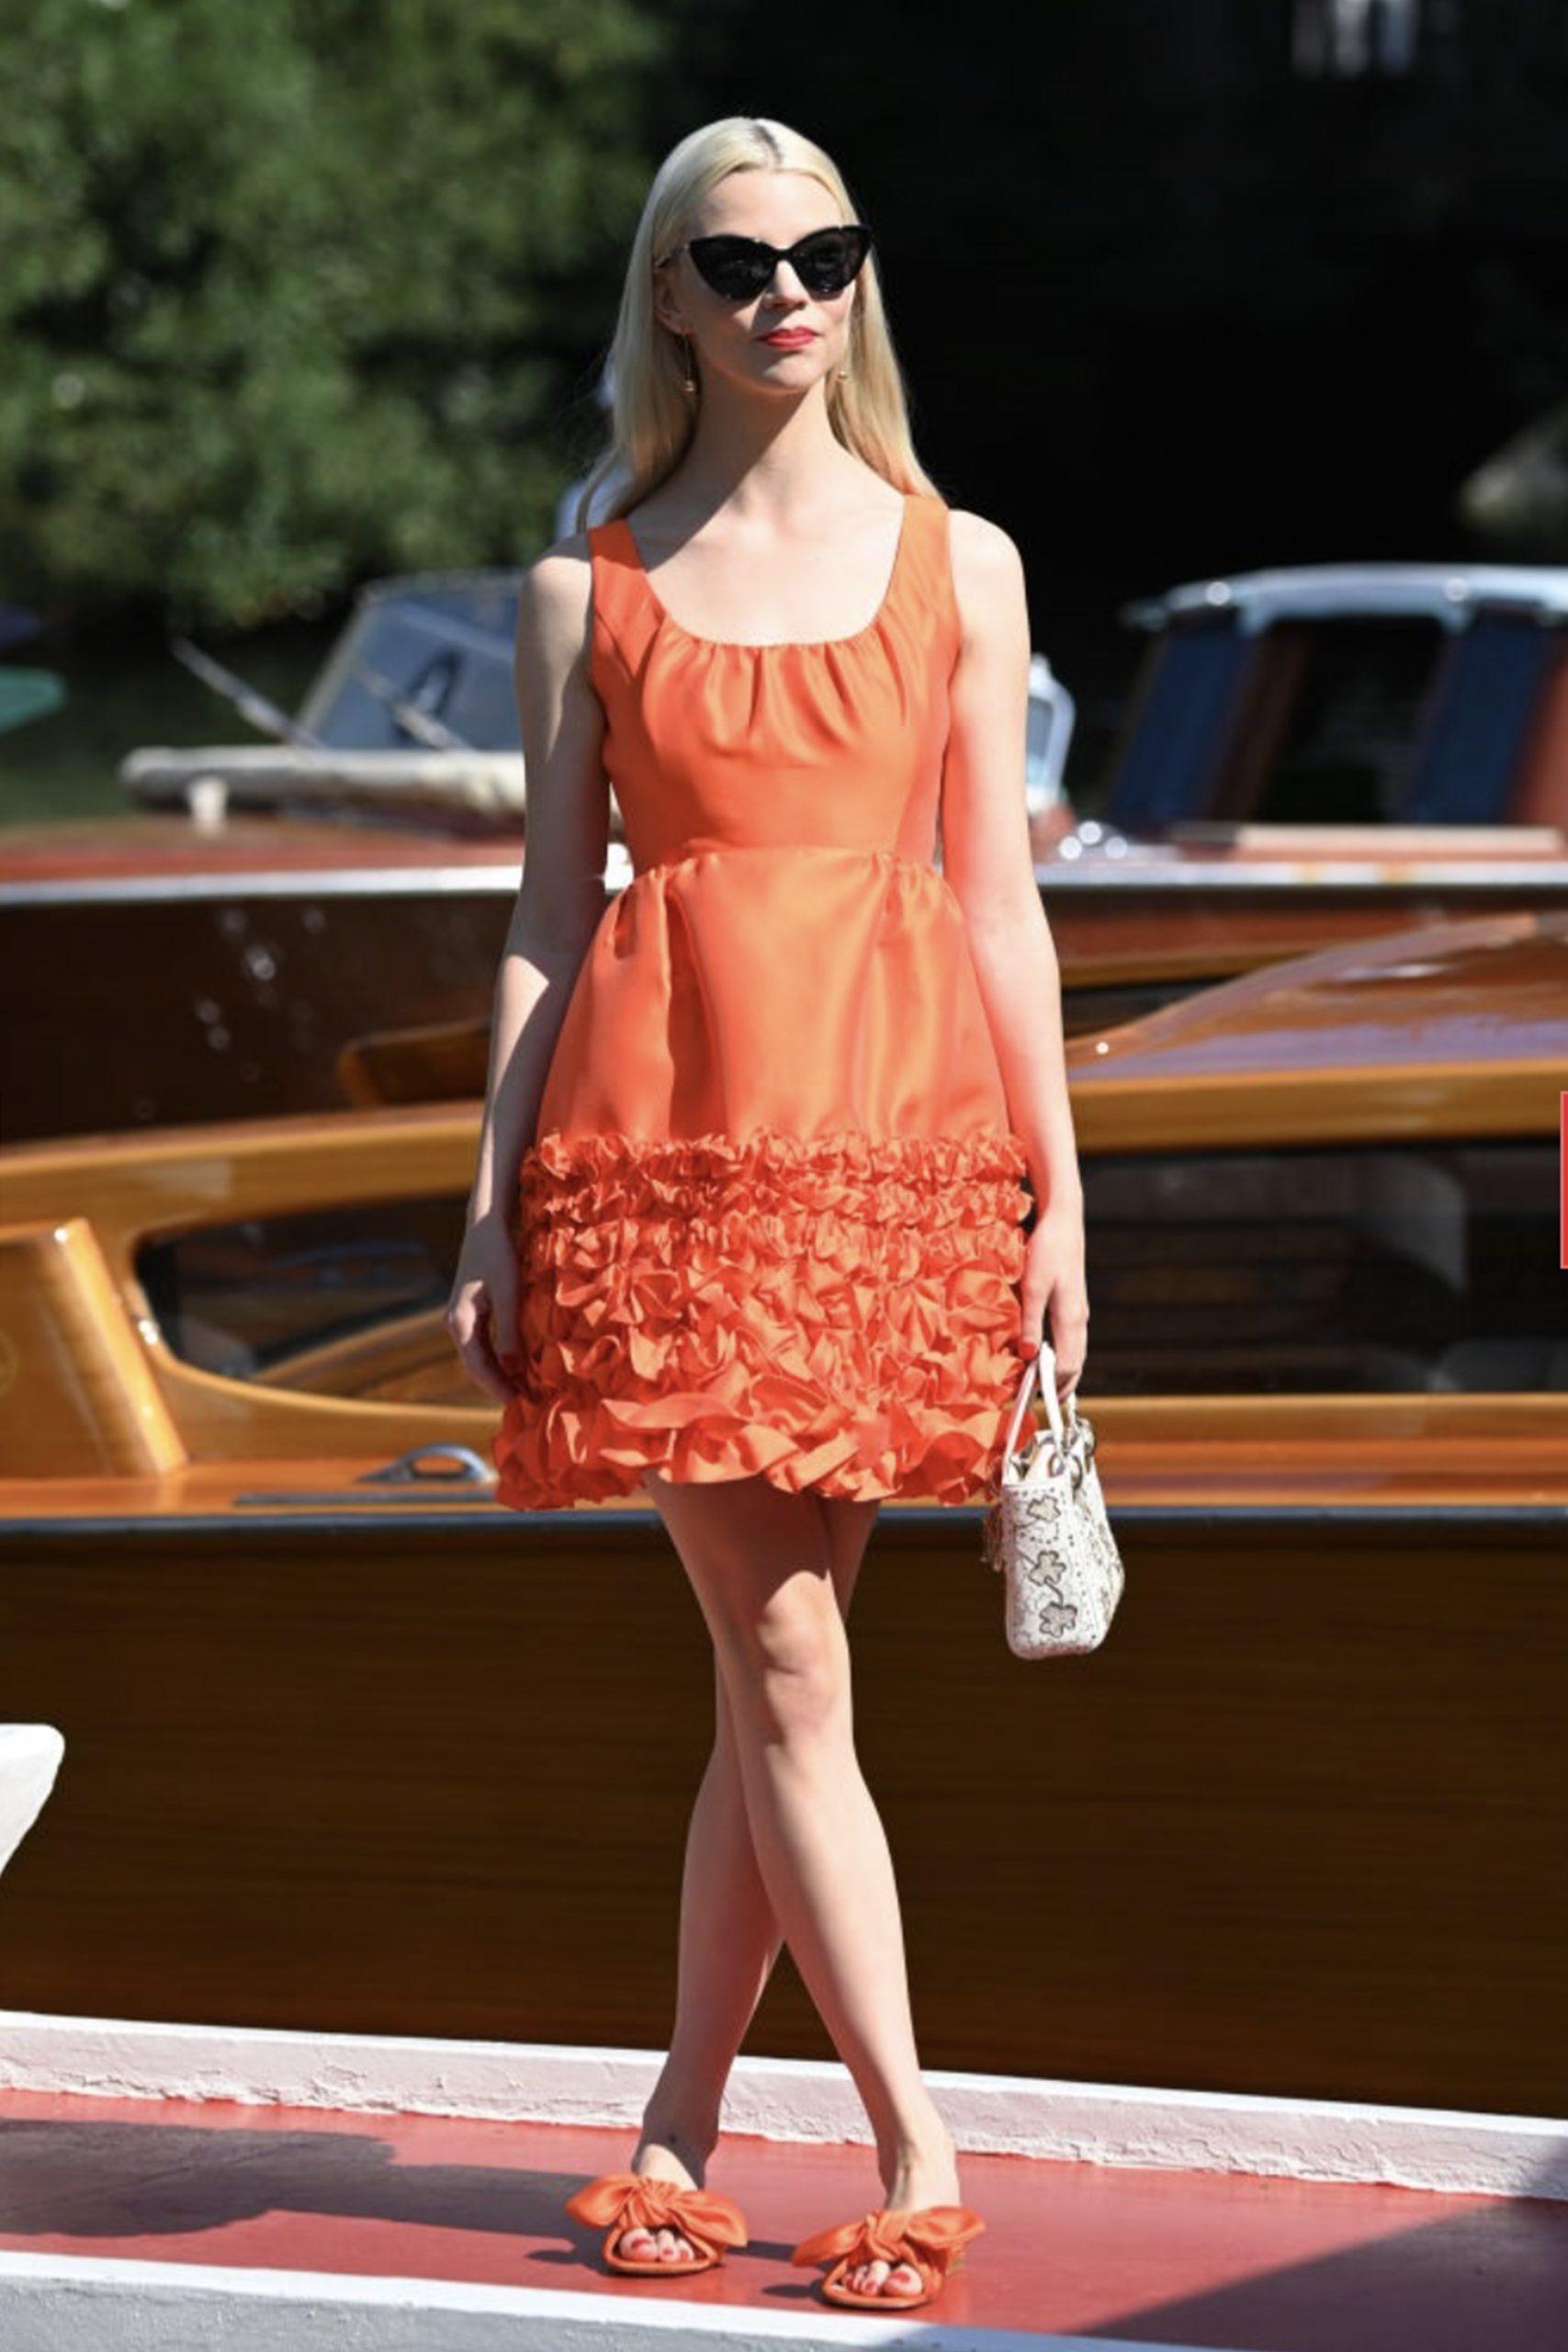 Taylor Joy al Festival di Venezia - Neomag.